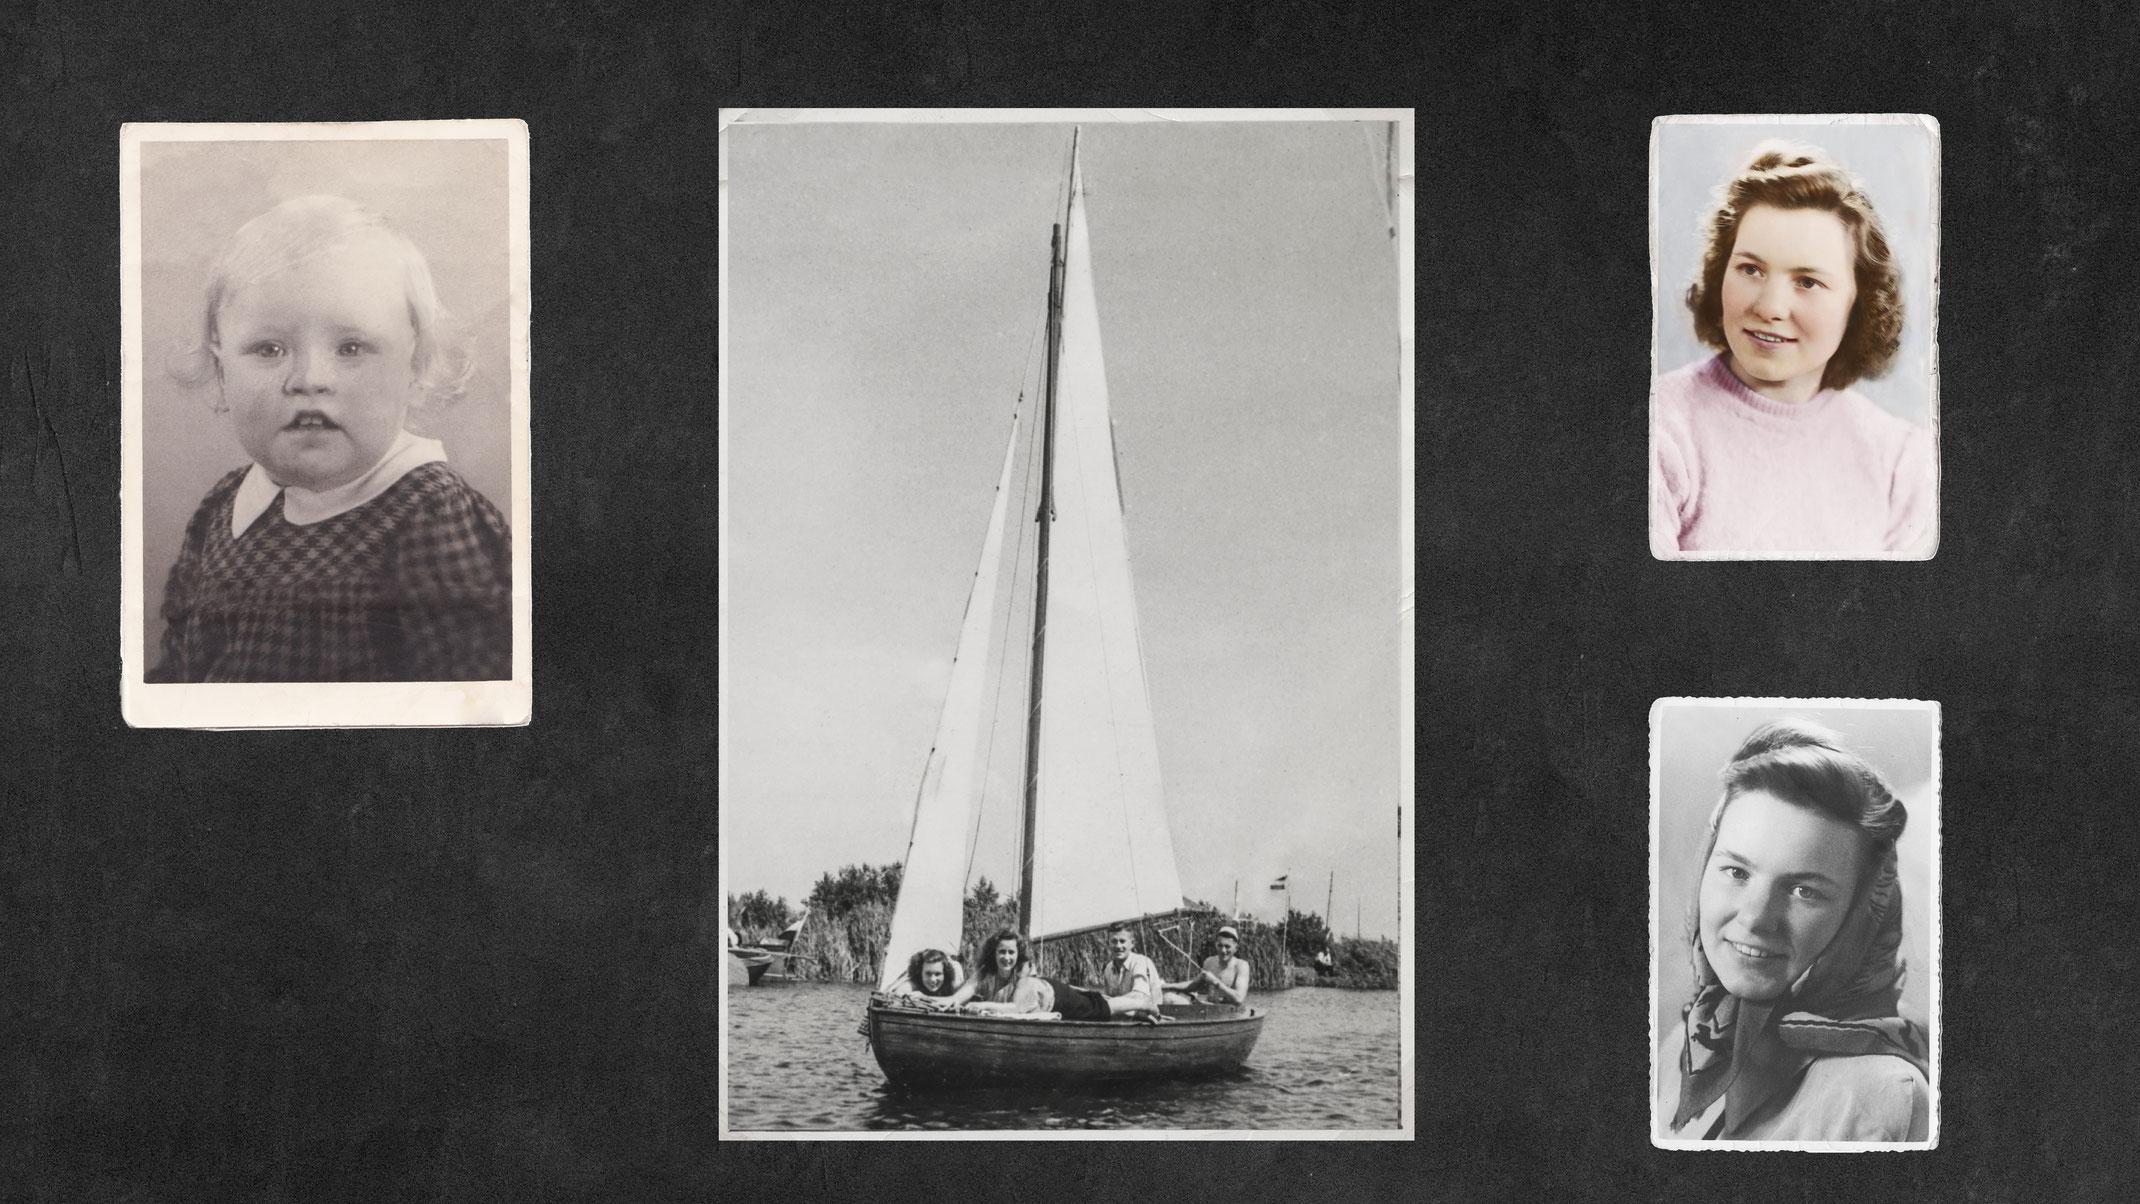 OriginStoryStudio-fotorestauratie-na-herstel-eindhoven